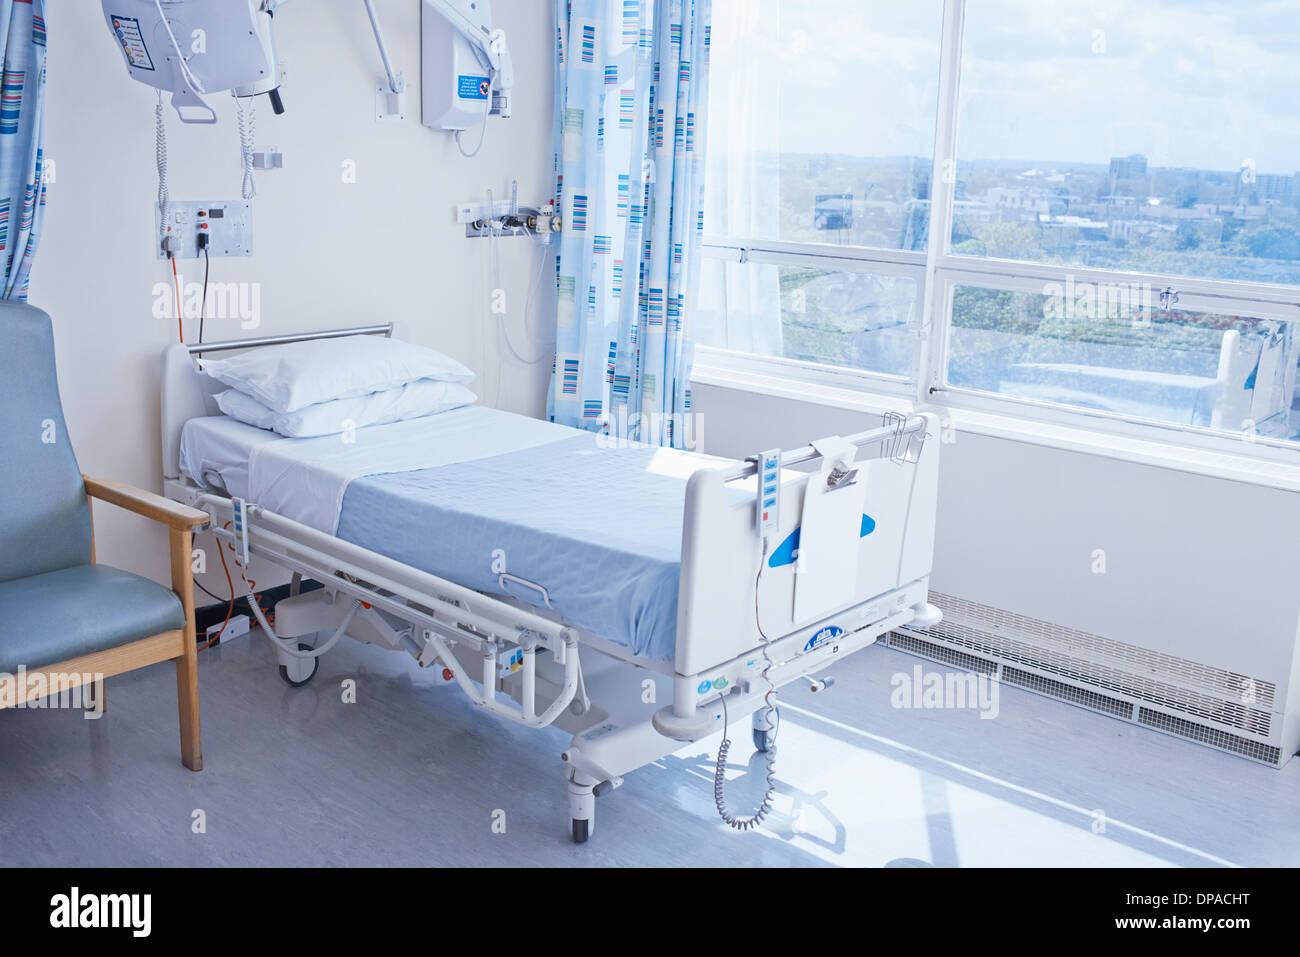 Empty hospital bed on hospital ward - Stock Image